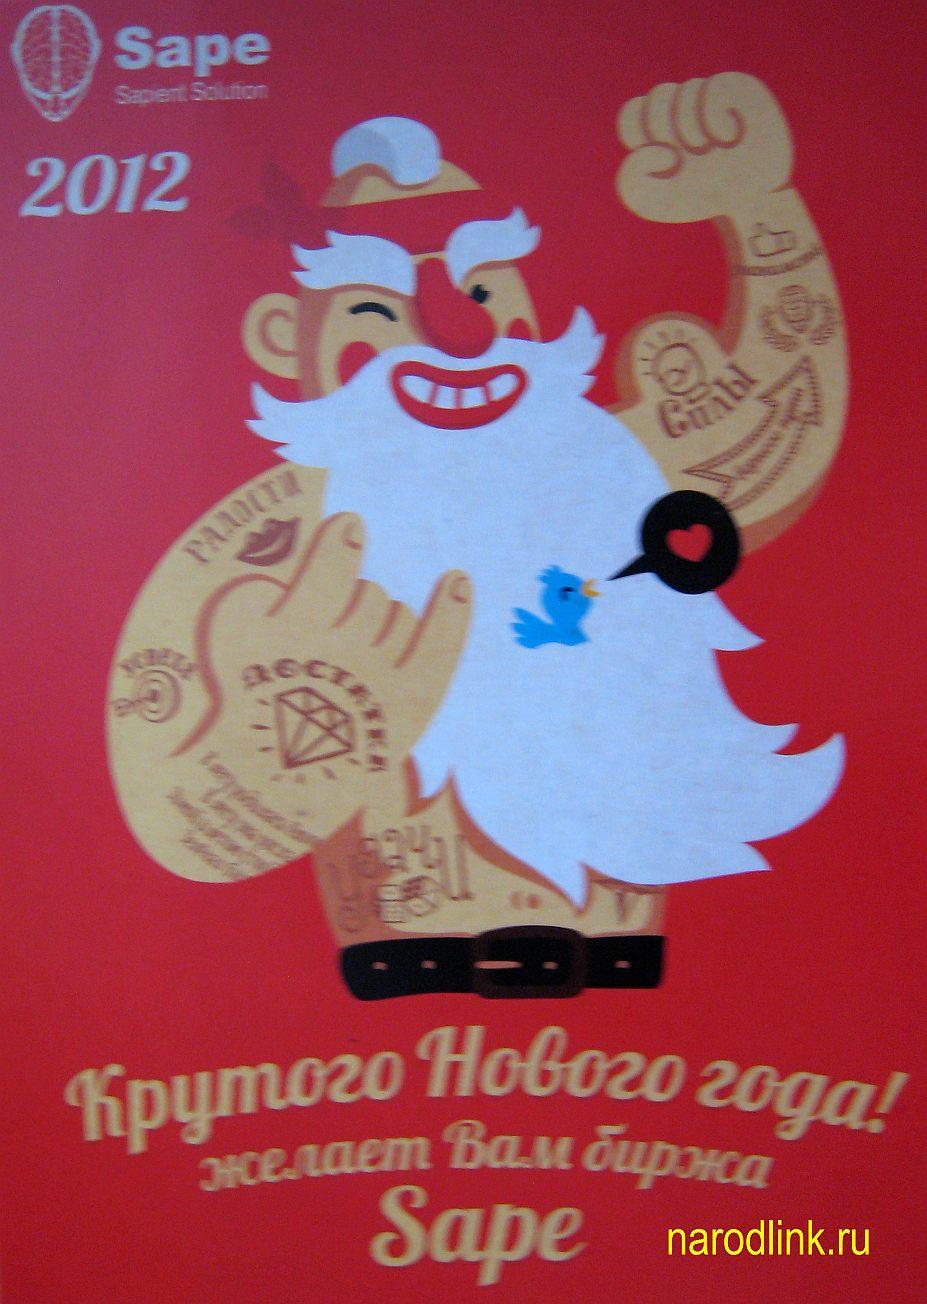 http://narodlink.ru/images/IMG_3560.JPG